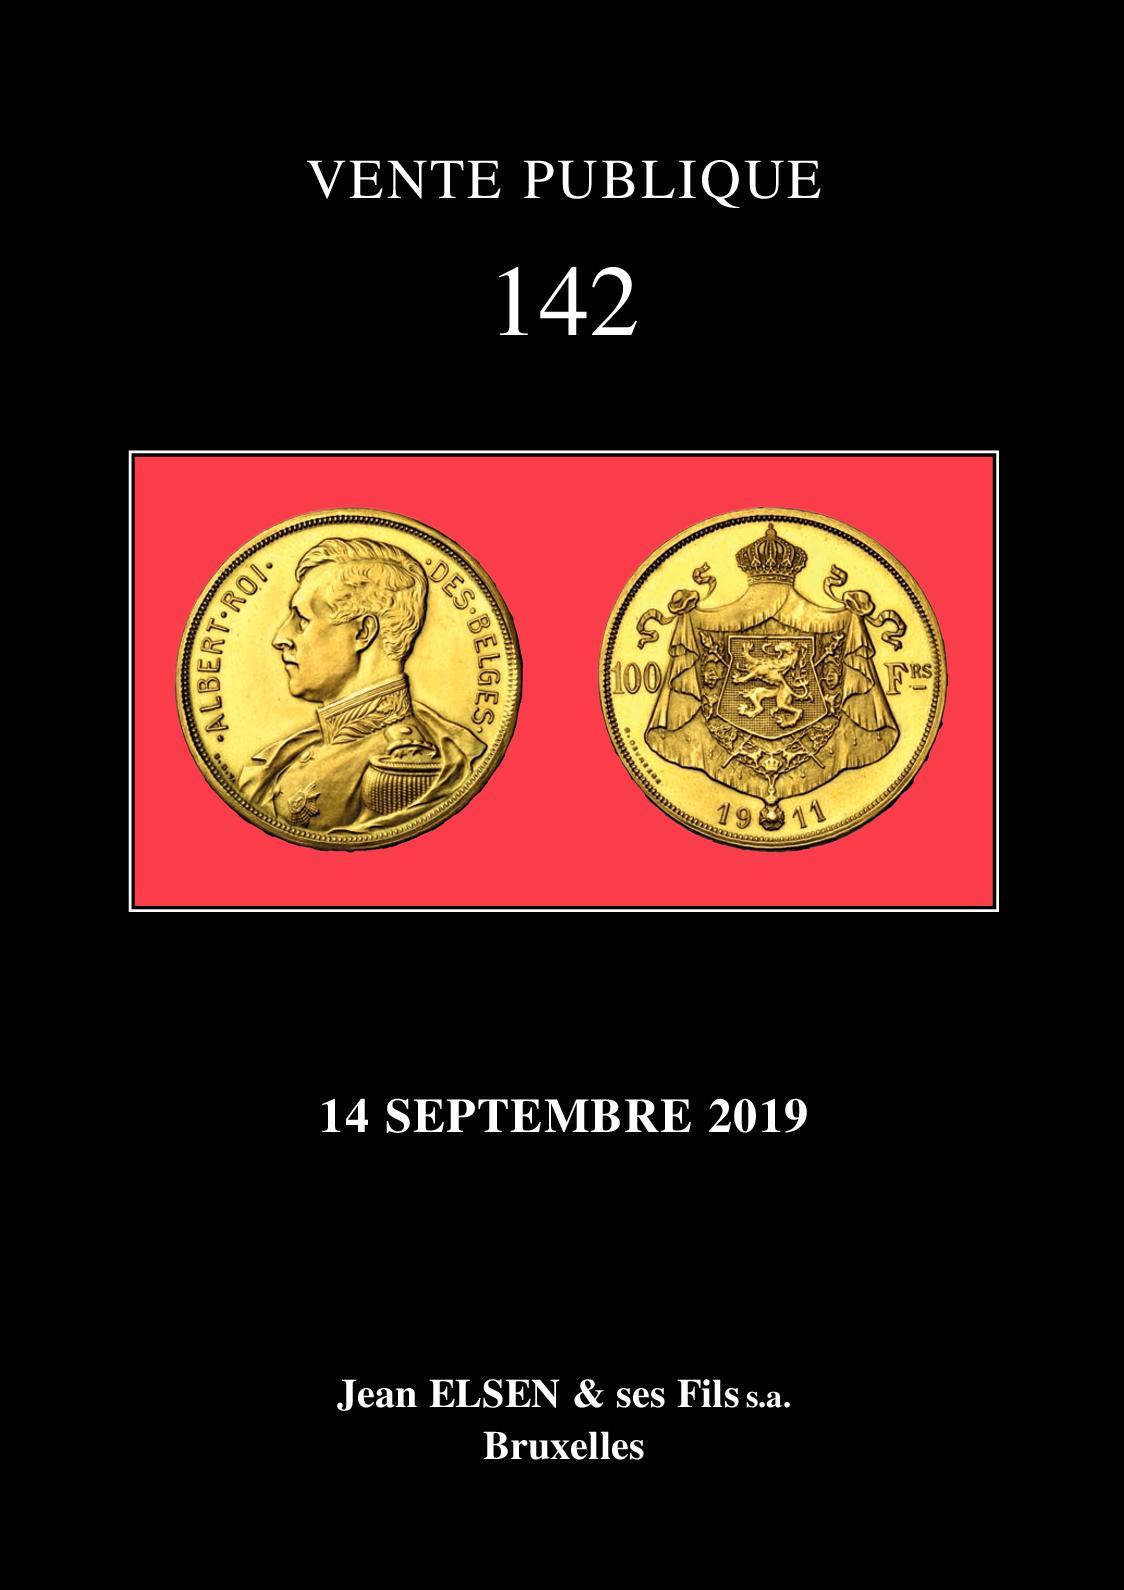 25 MINI BUSTE GOLD 52 x 71 mm 90g